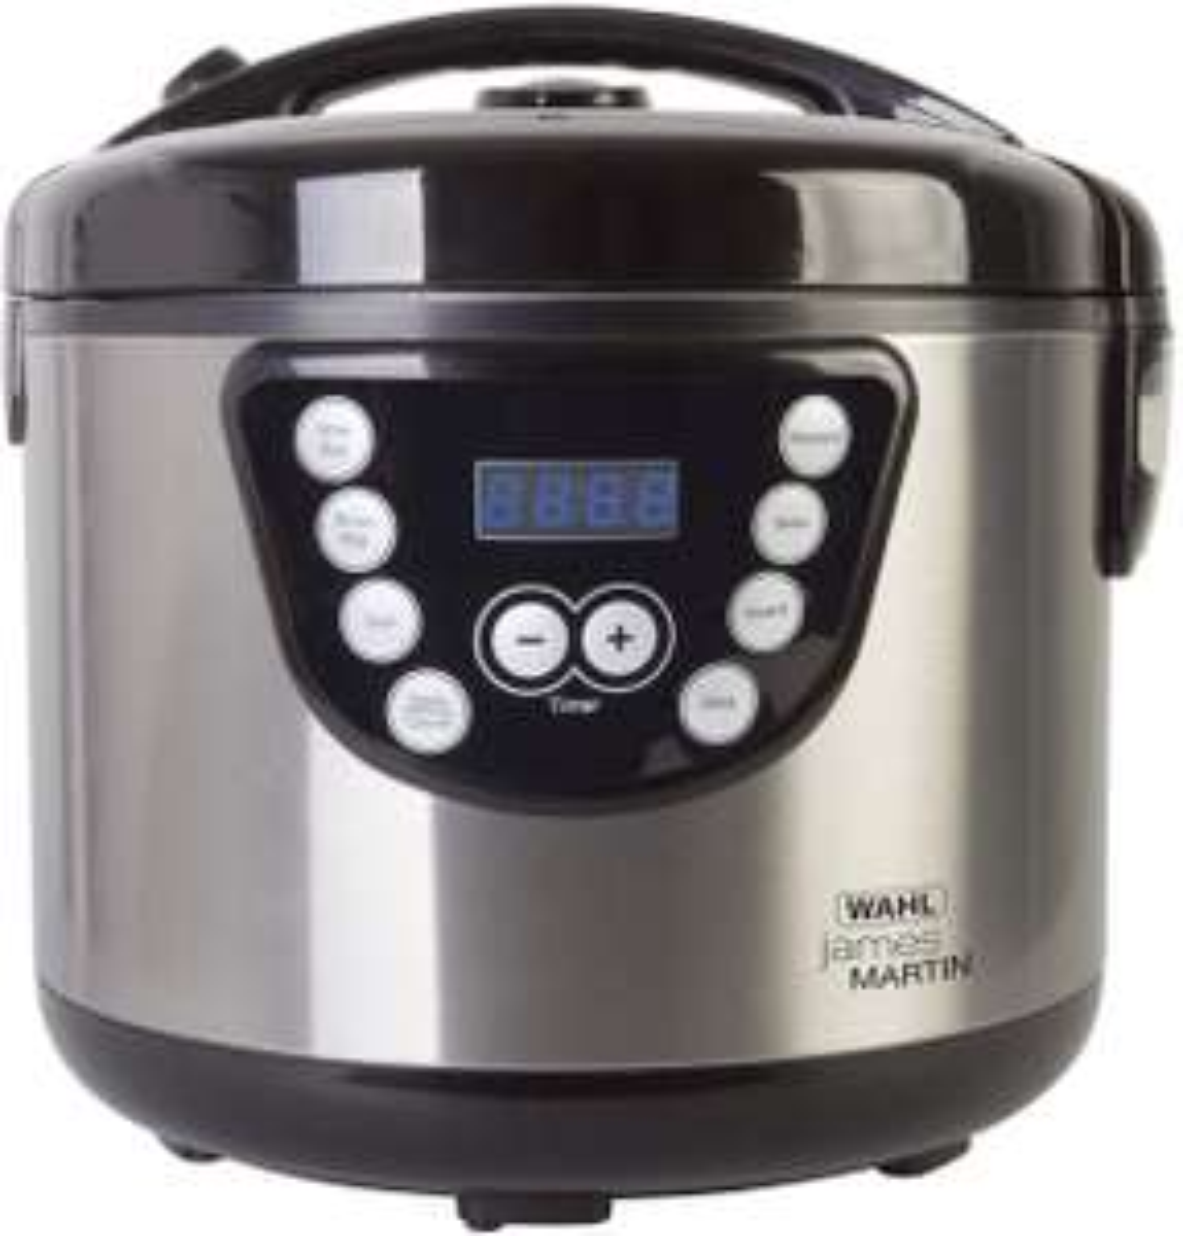 Wahl James Martin Multi Cooker for £36.80 delivered @ Amazon